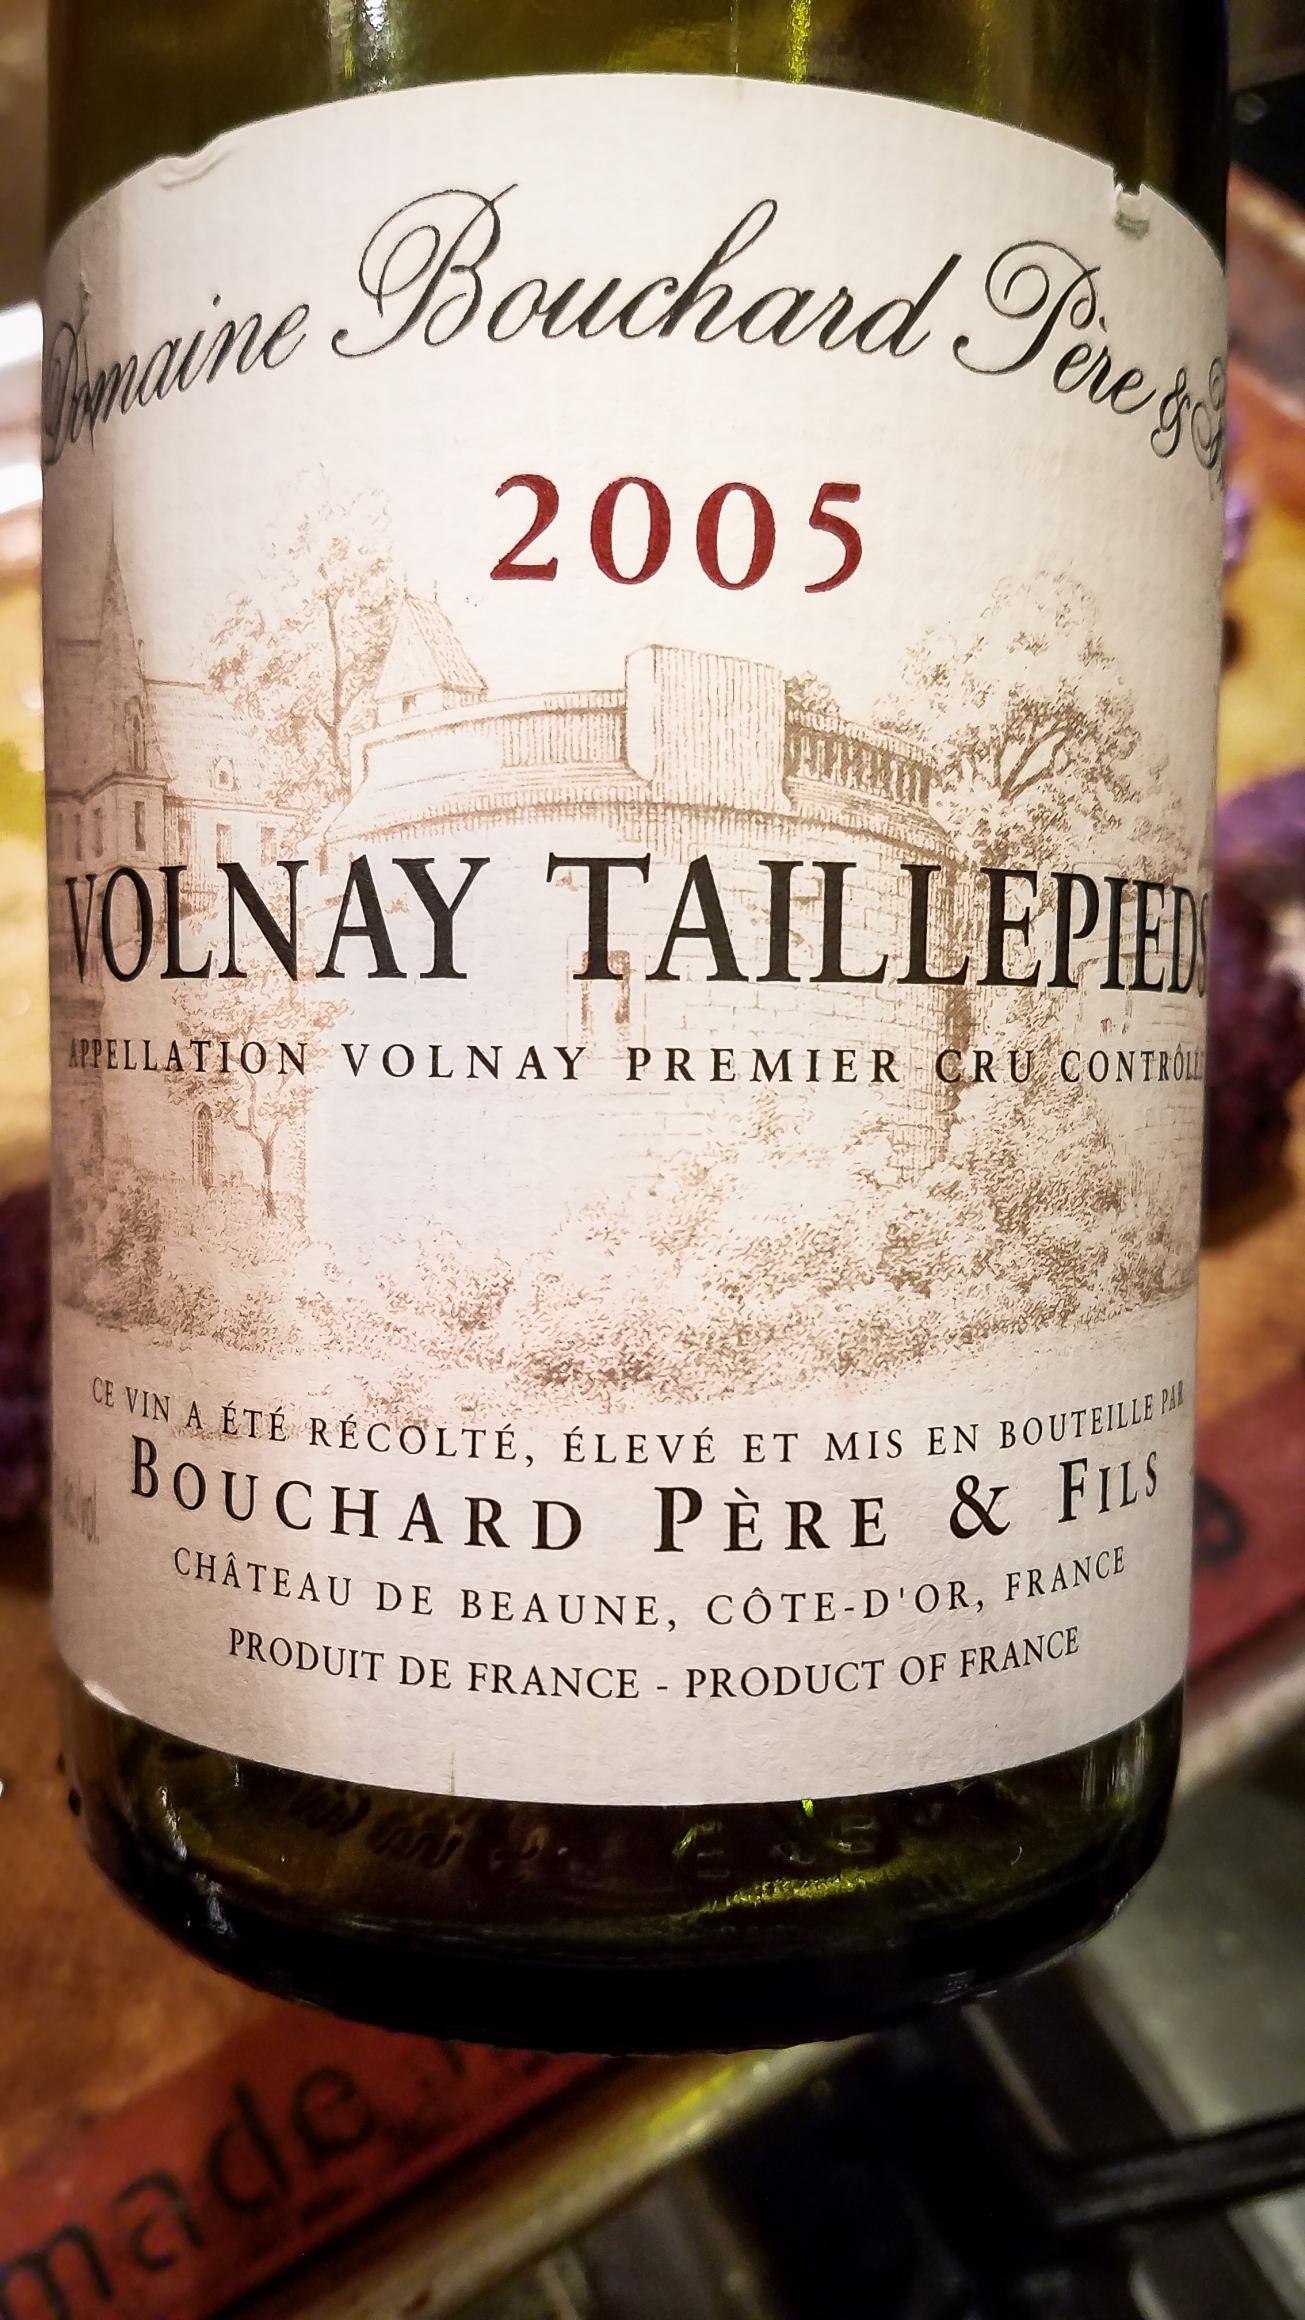 2005 Bouchard Père et Fils Volnay 1er Cru Taillepieds